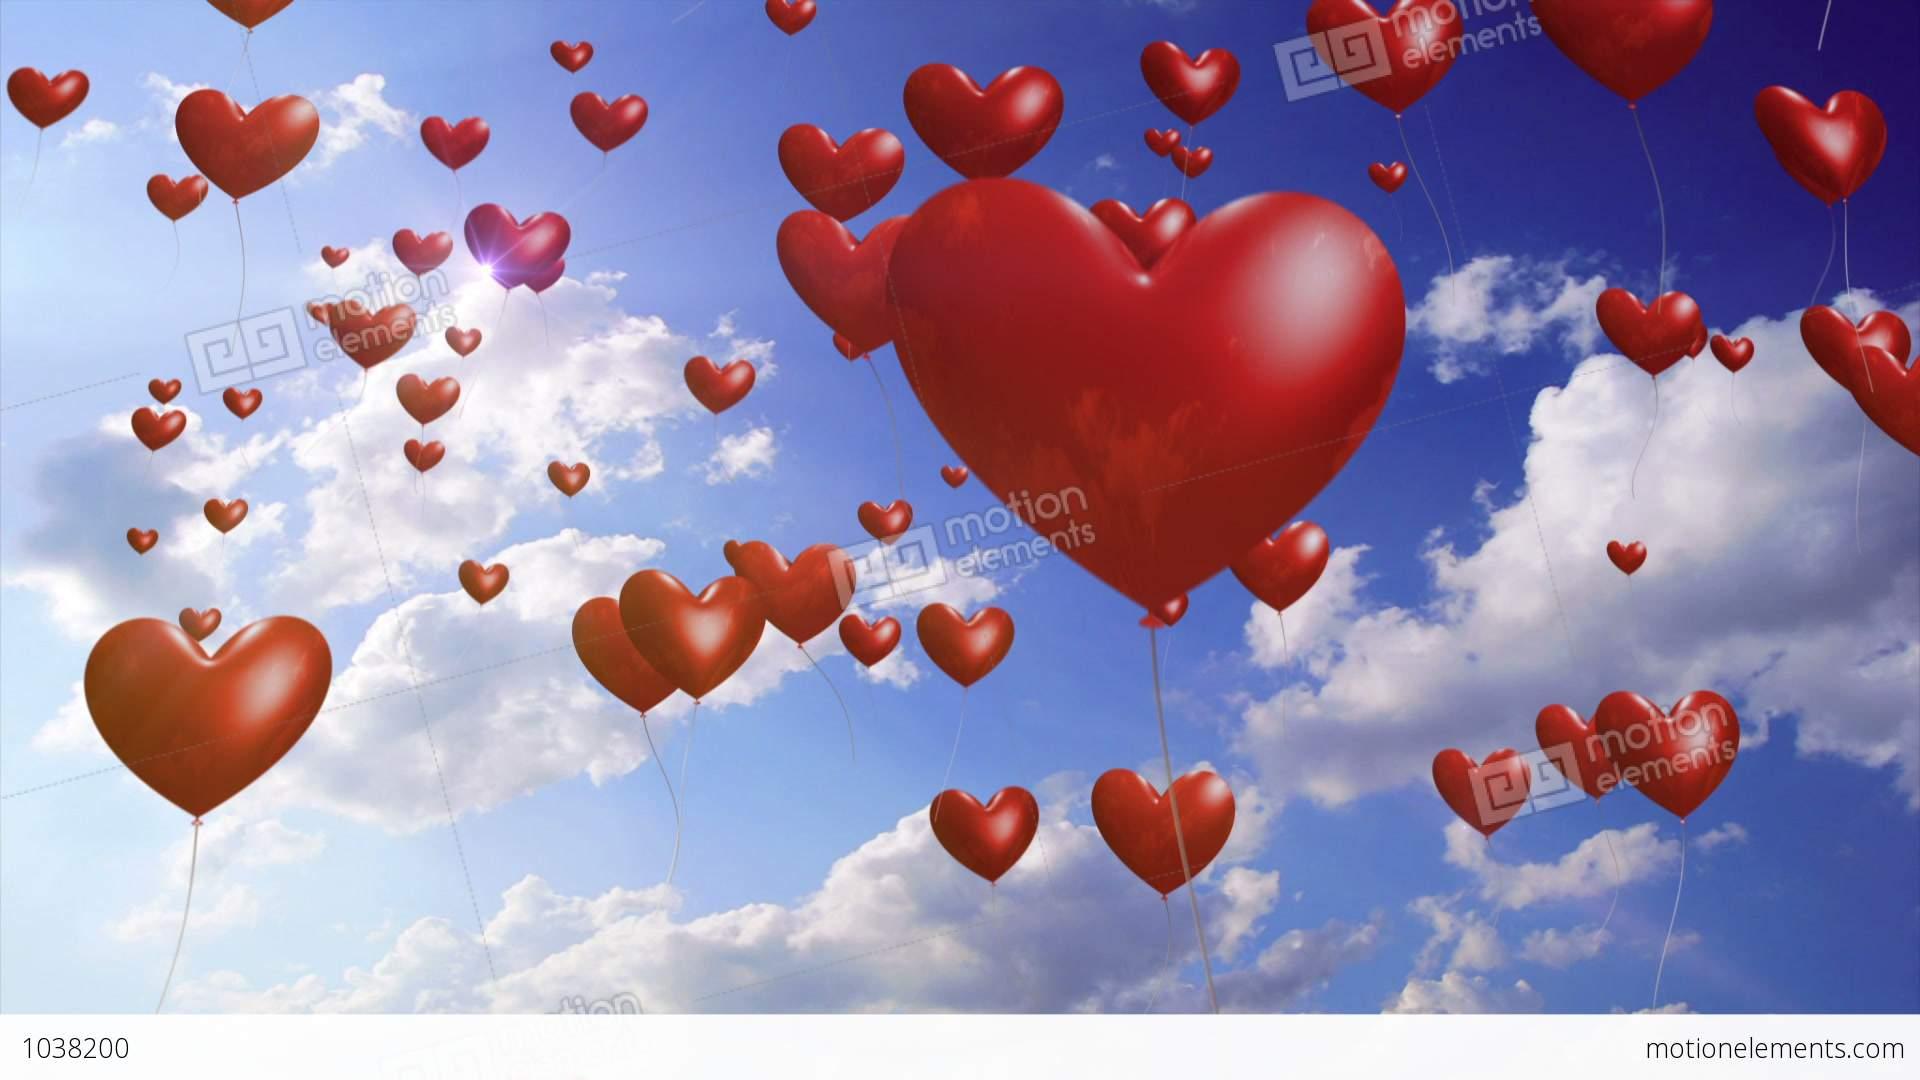 desktop wallpaper valentine heart balloons - photo #26